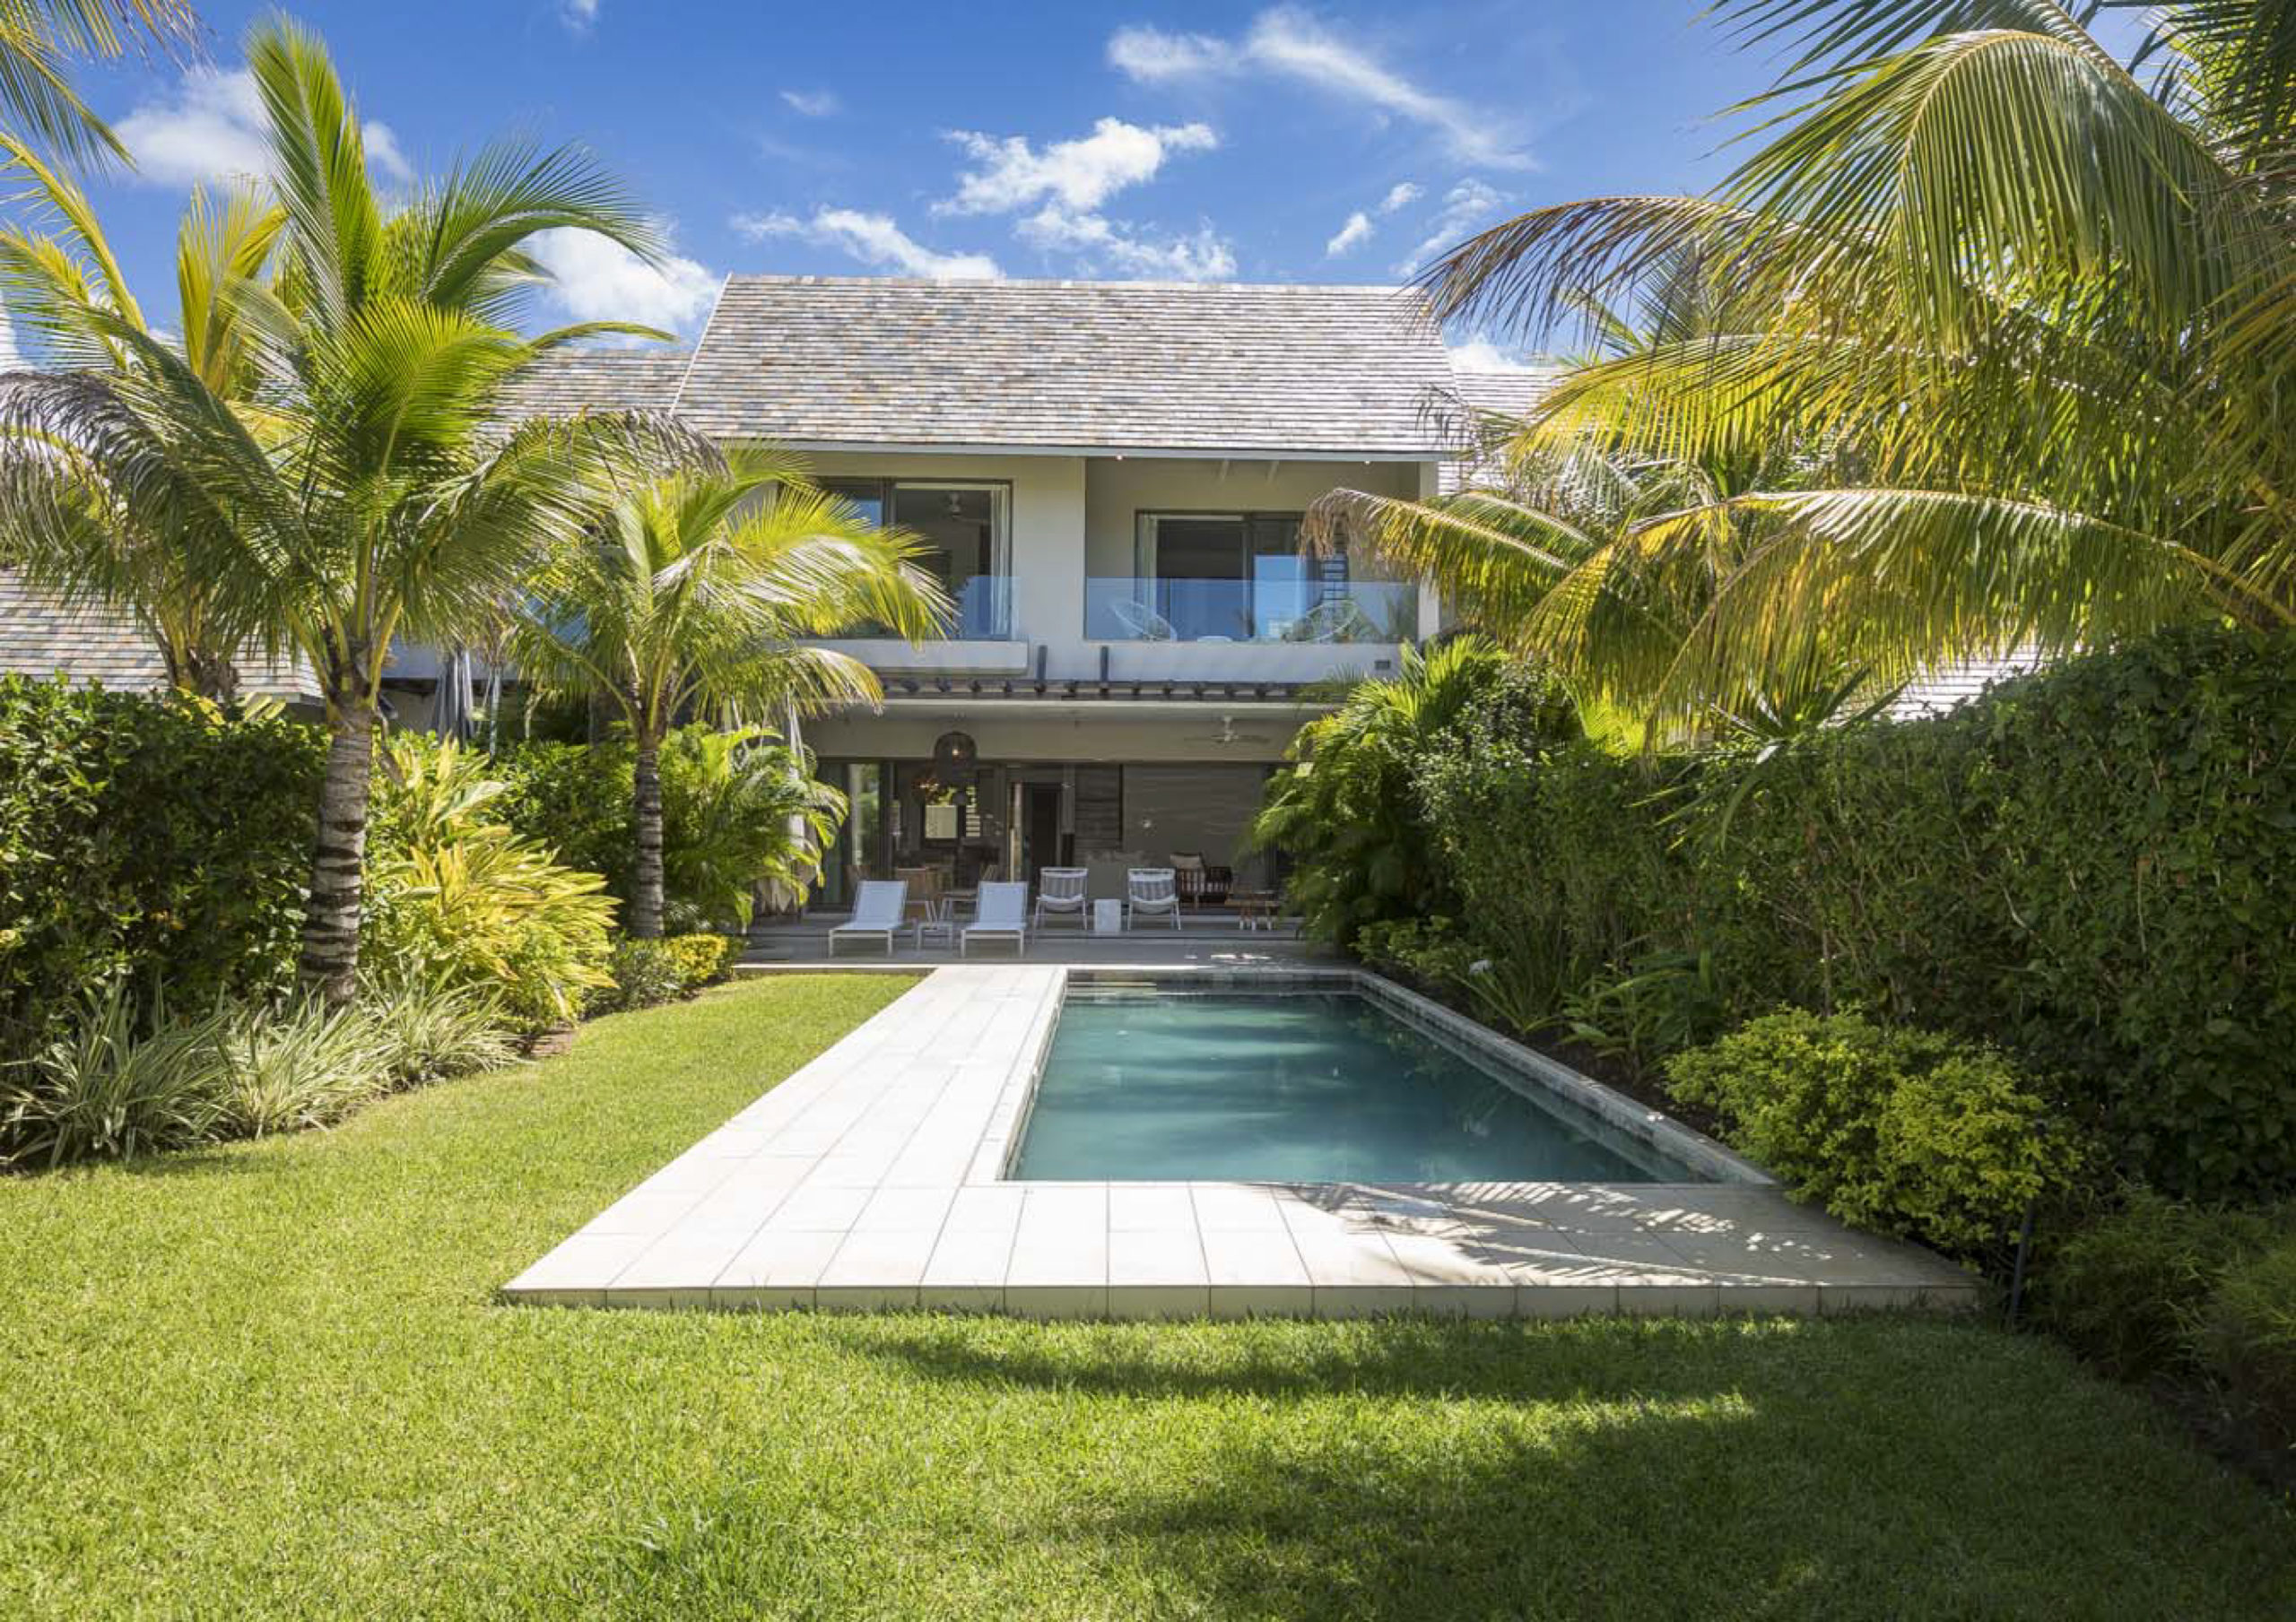 Anahita Golf & Spa Resort Villa jumelée IRS 3 chambres à vendre